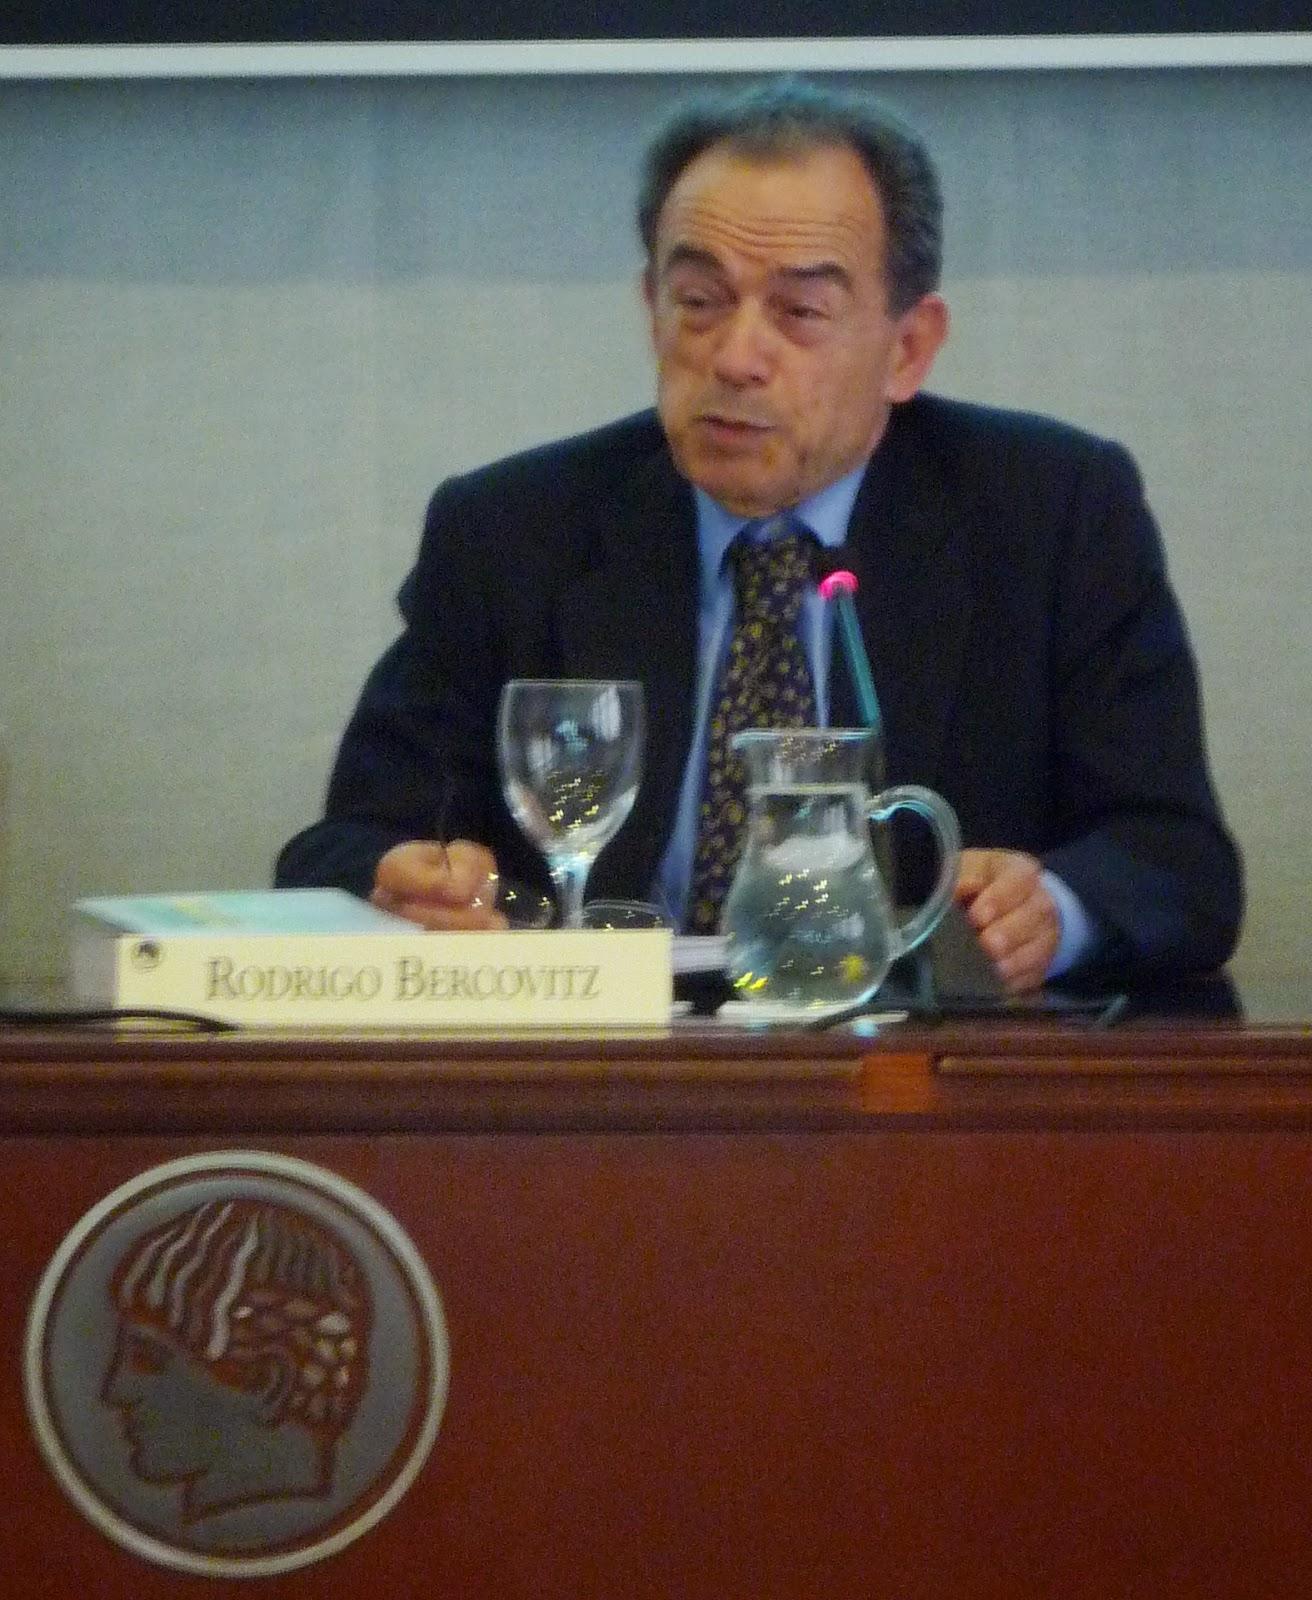 Rodrigo Bercovitz